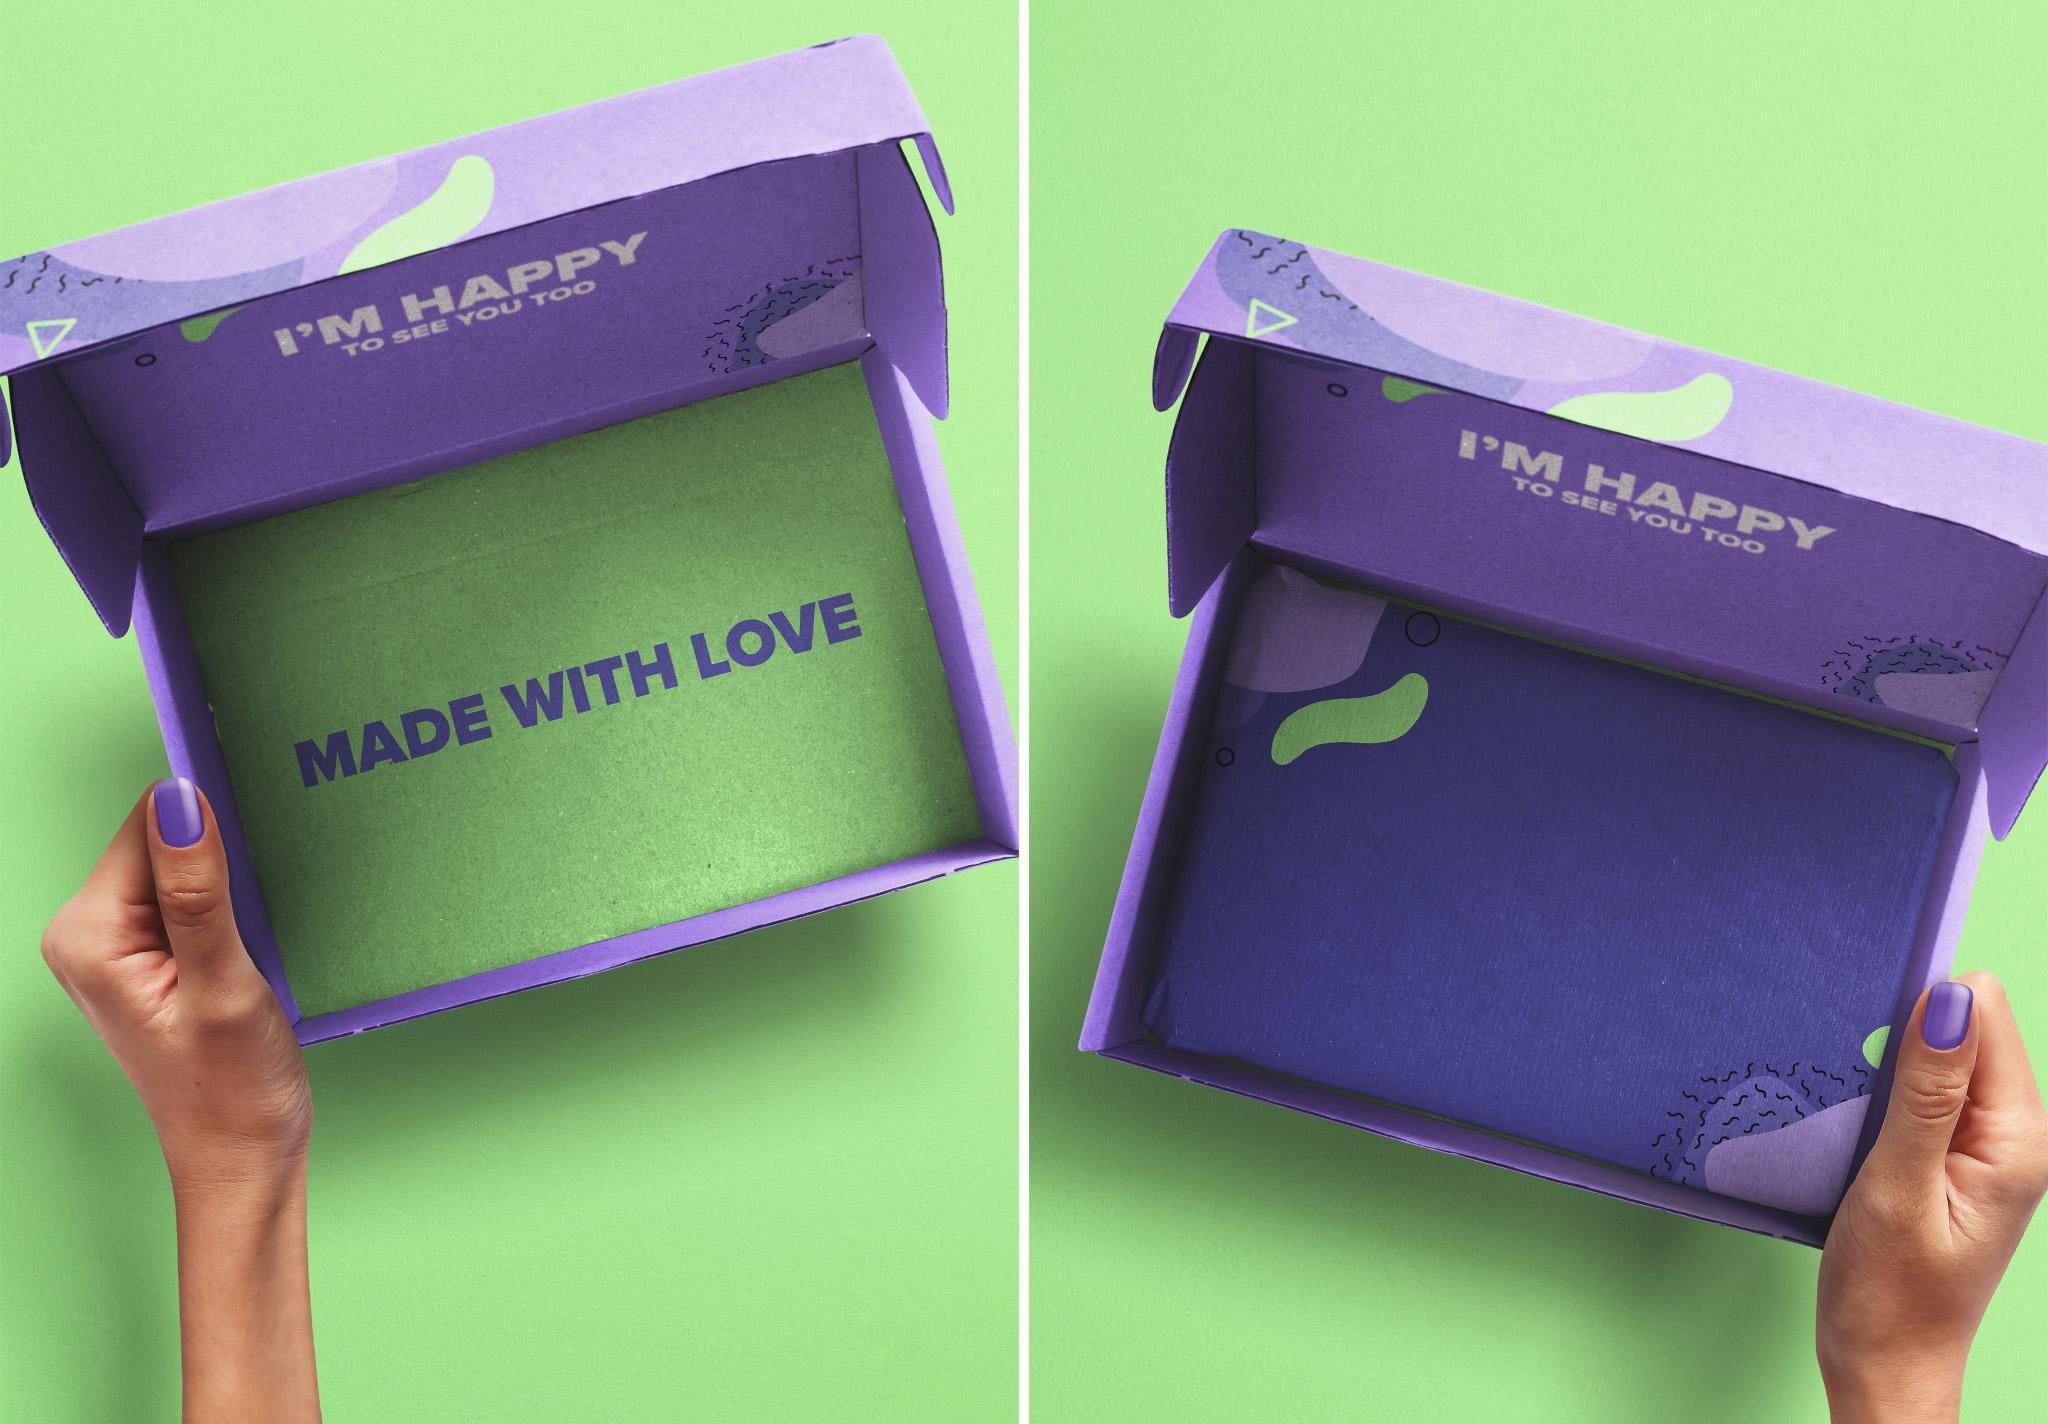 Hands Holding Opened Postal Box Mockup 2 image03